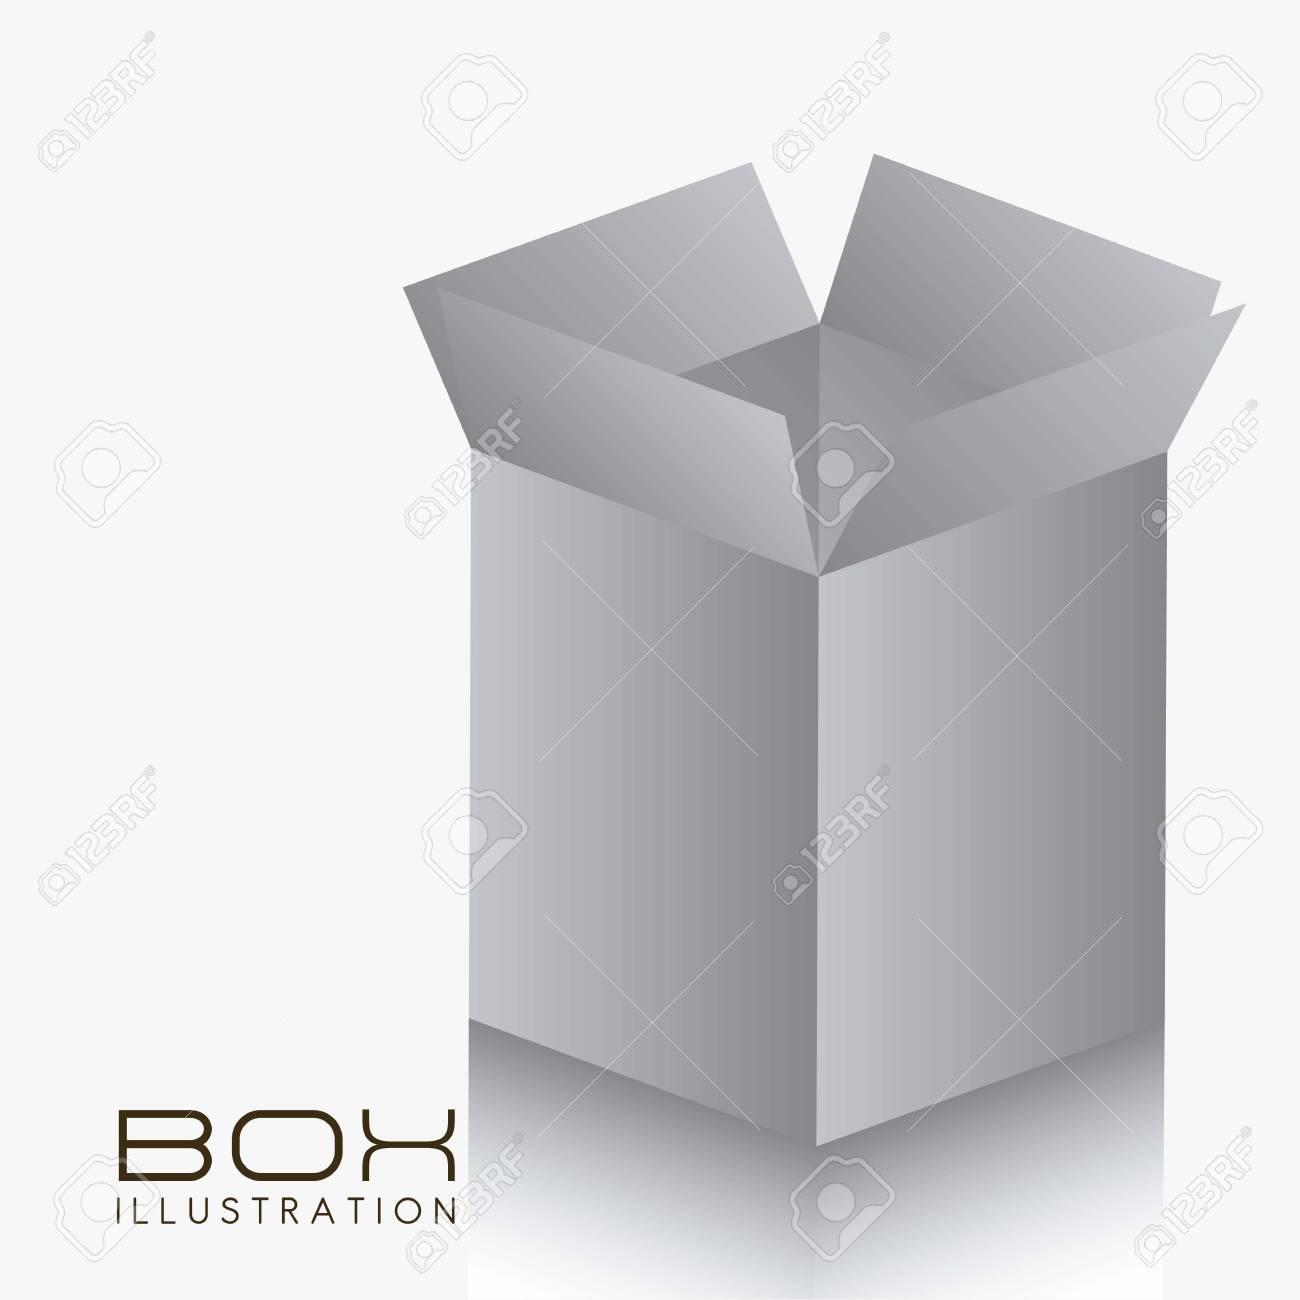 illustration of gray box on white background illustration Stock Vector - 14628020